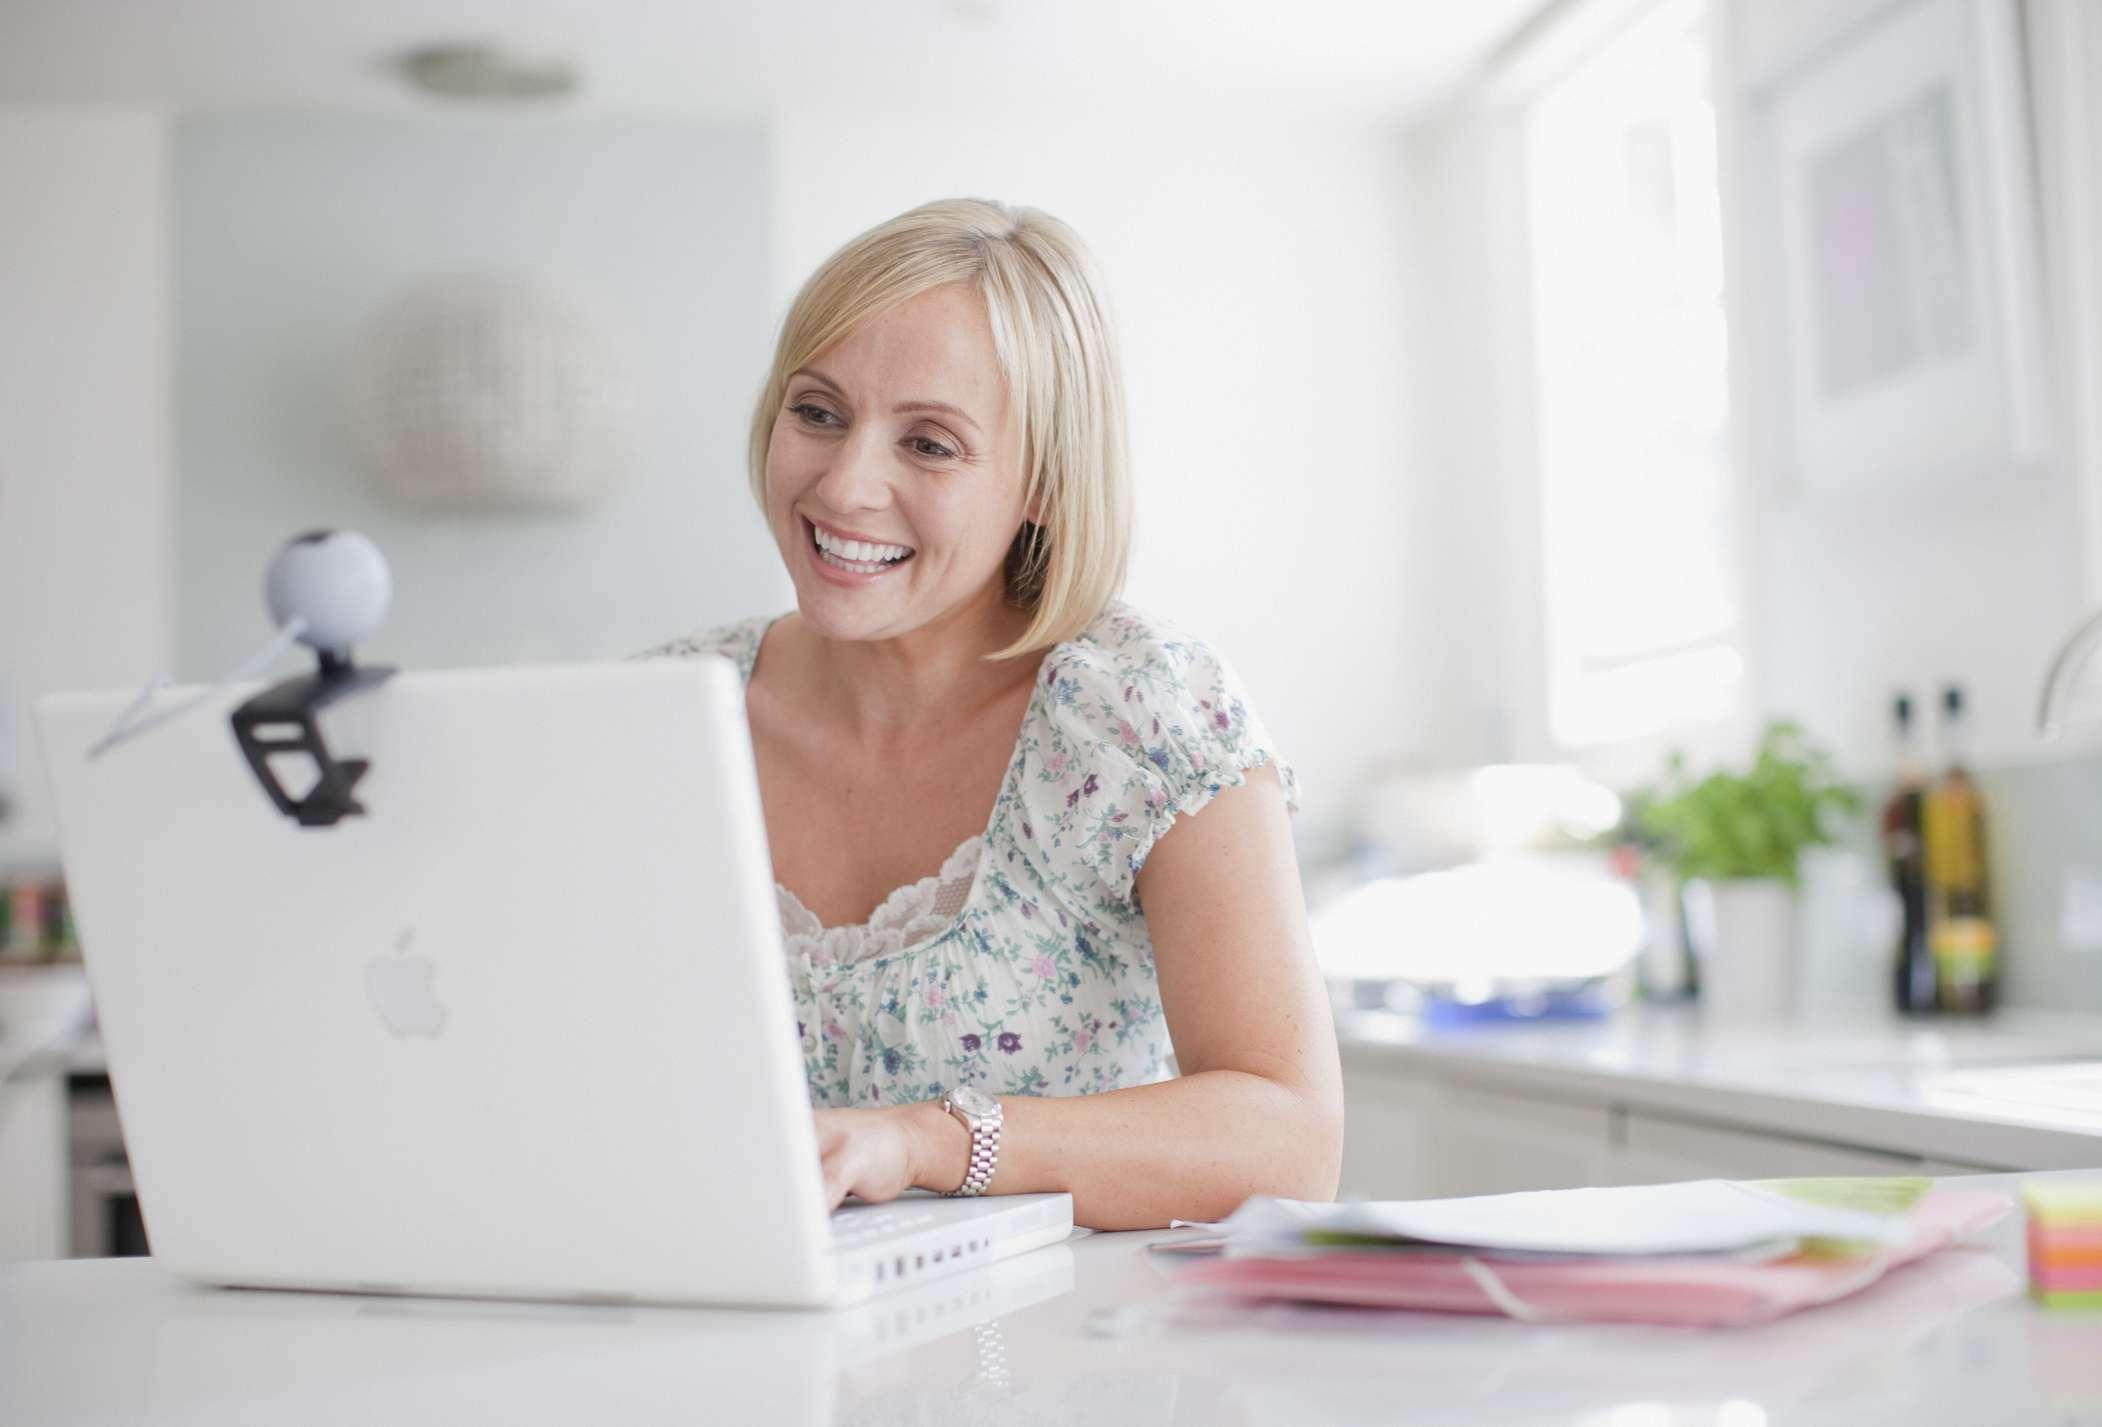 A woman using a webcam on a laptop computer.